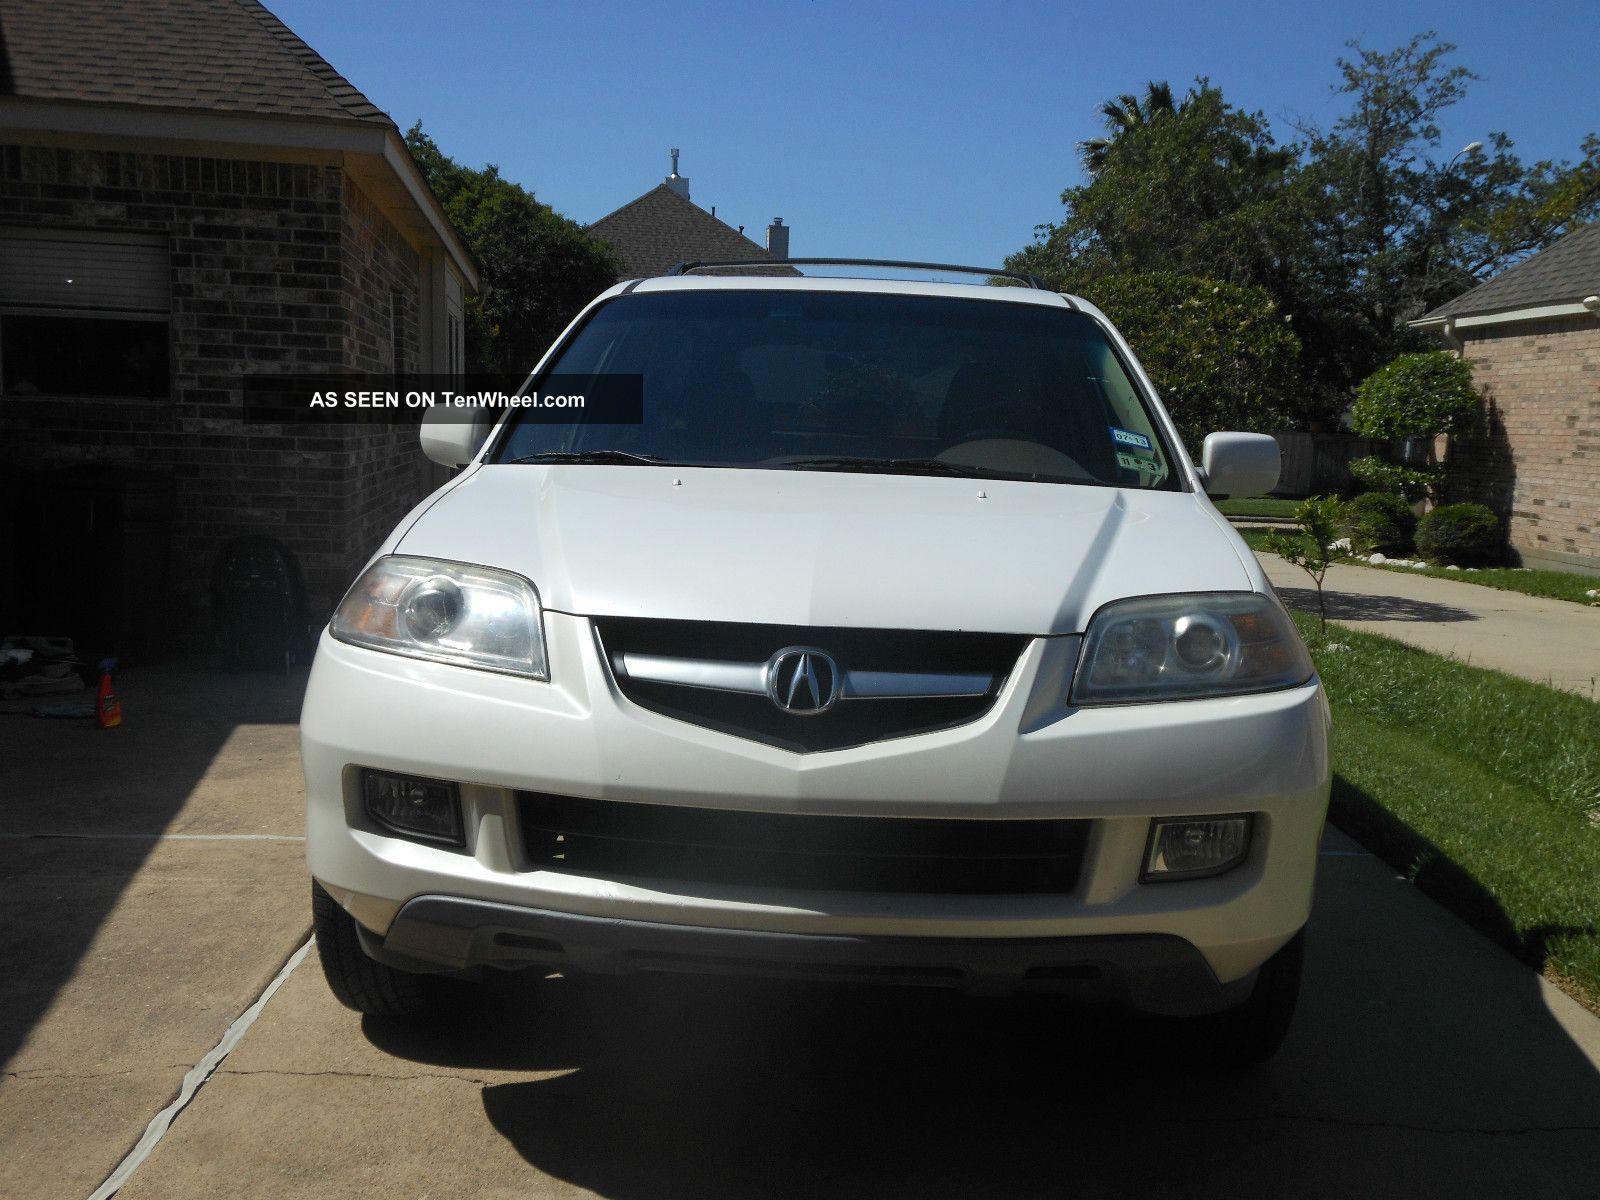 2005 Acura Mdx Touring Sport Utility 4